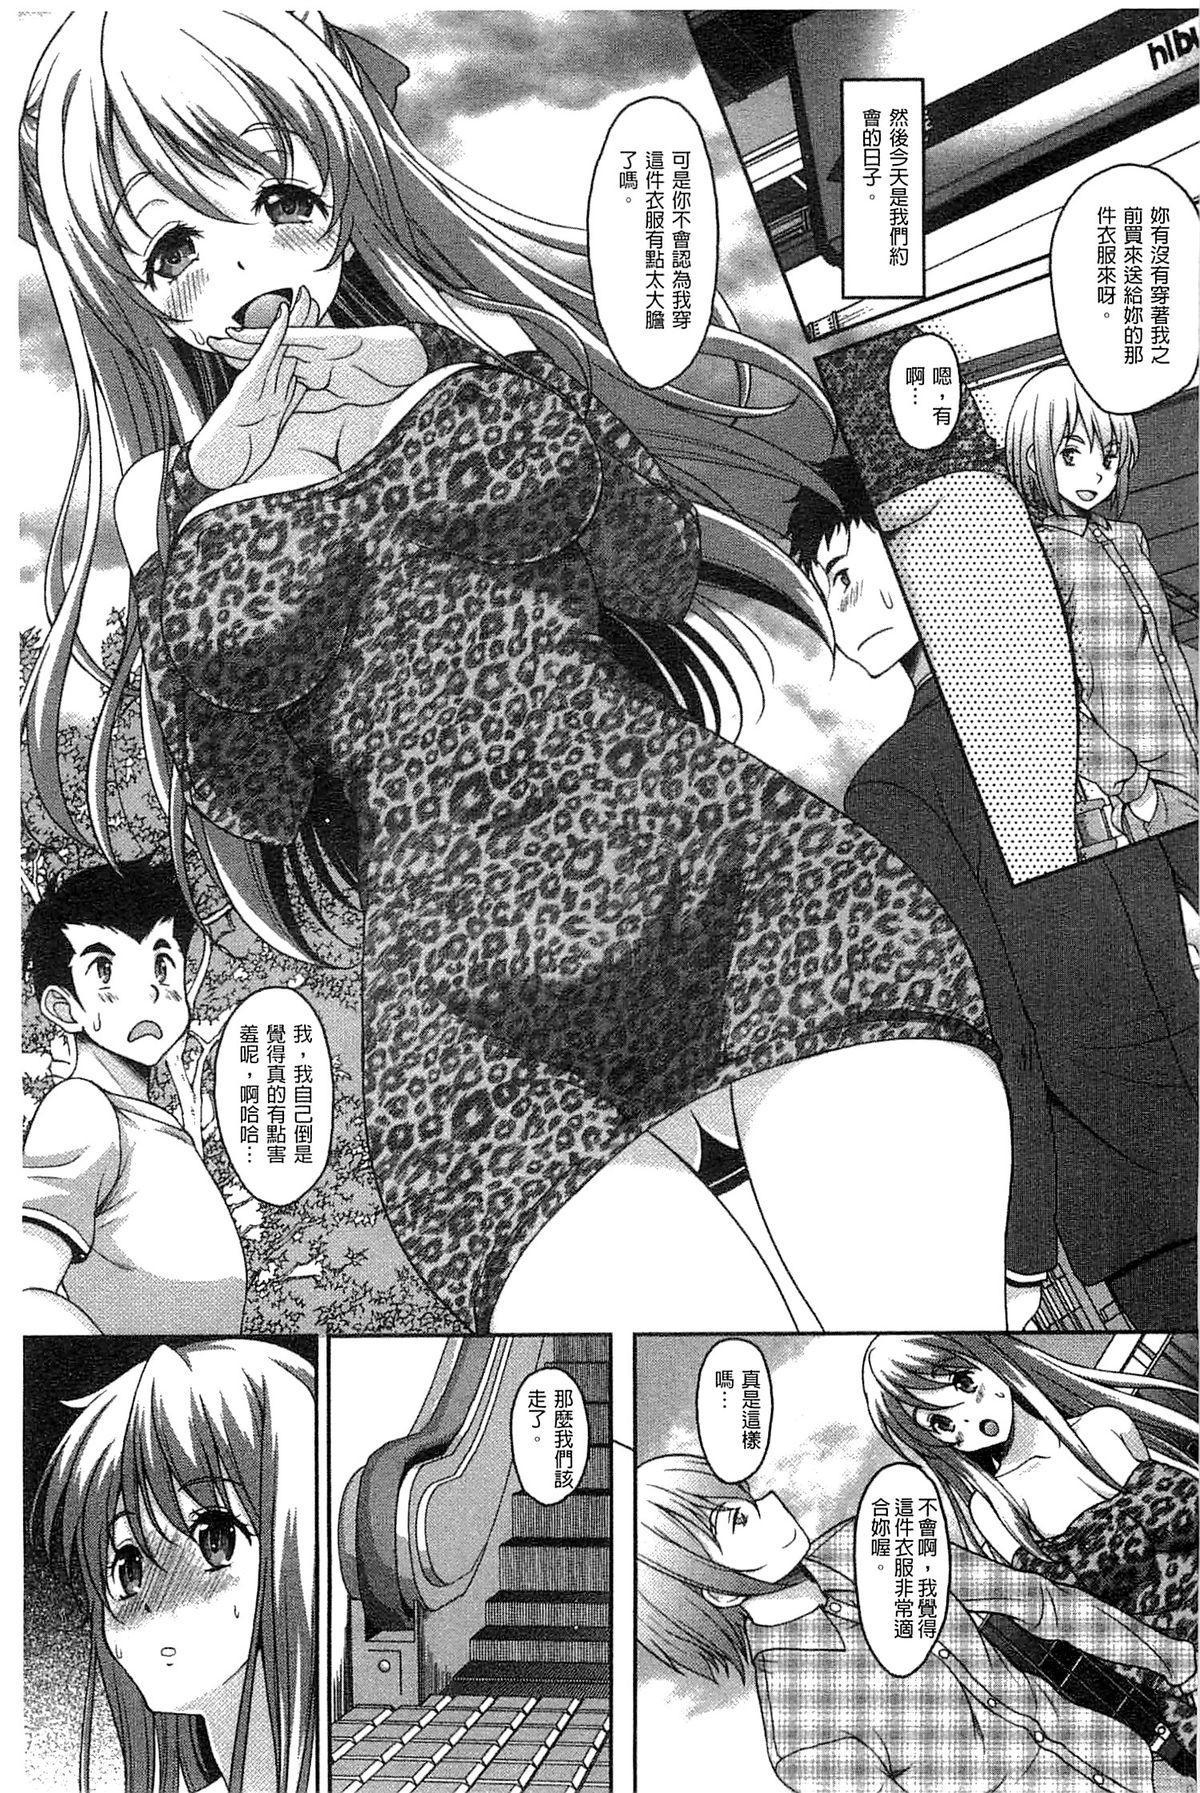 Hajimete nan dakara - First sexual experience 33